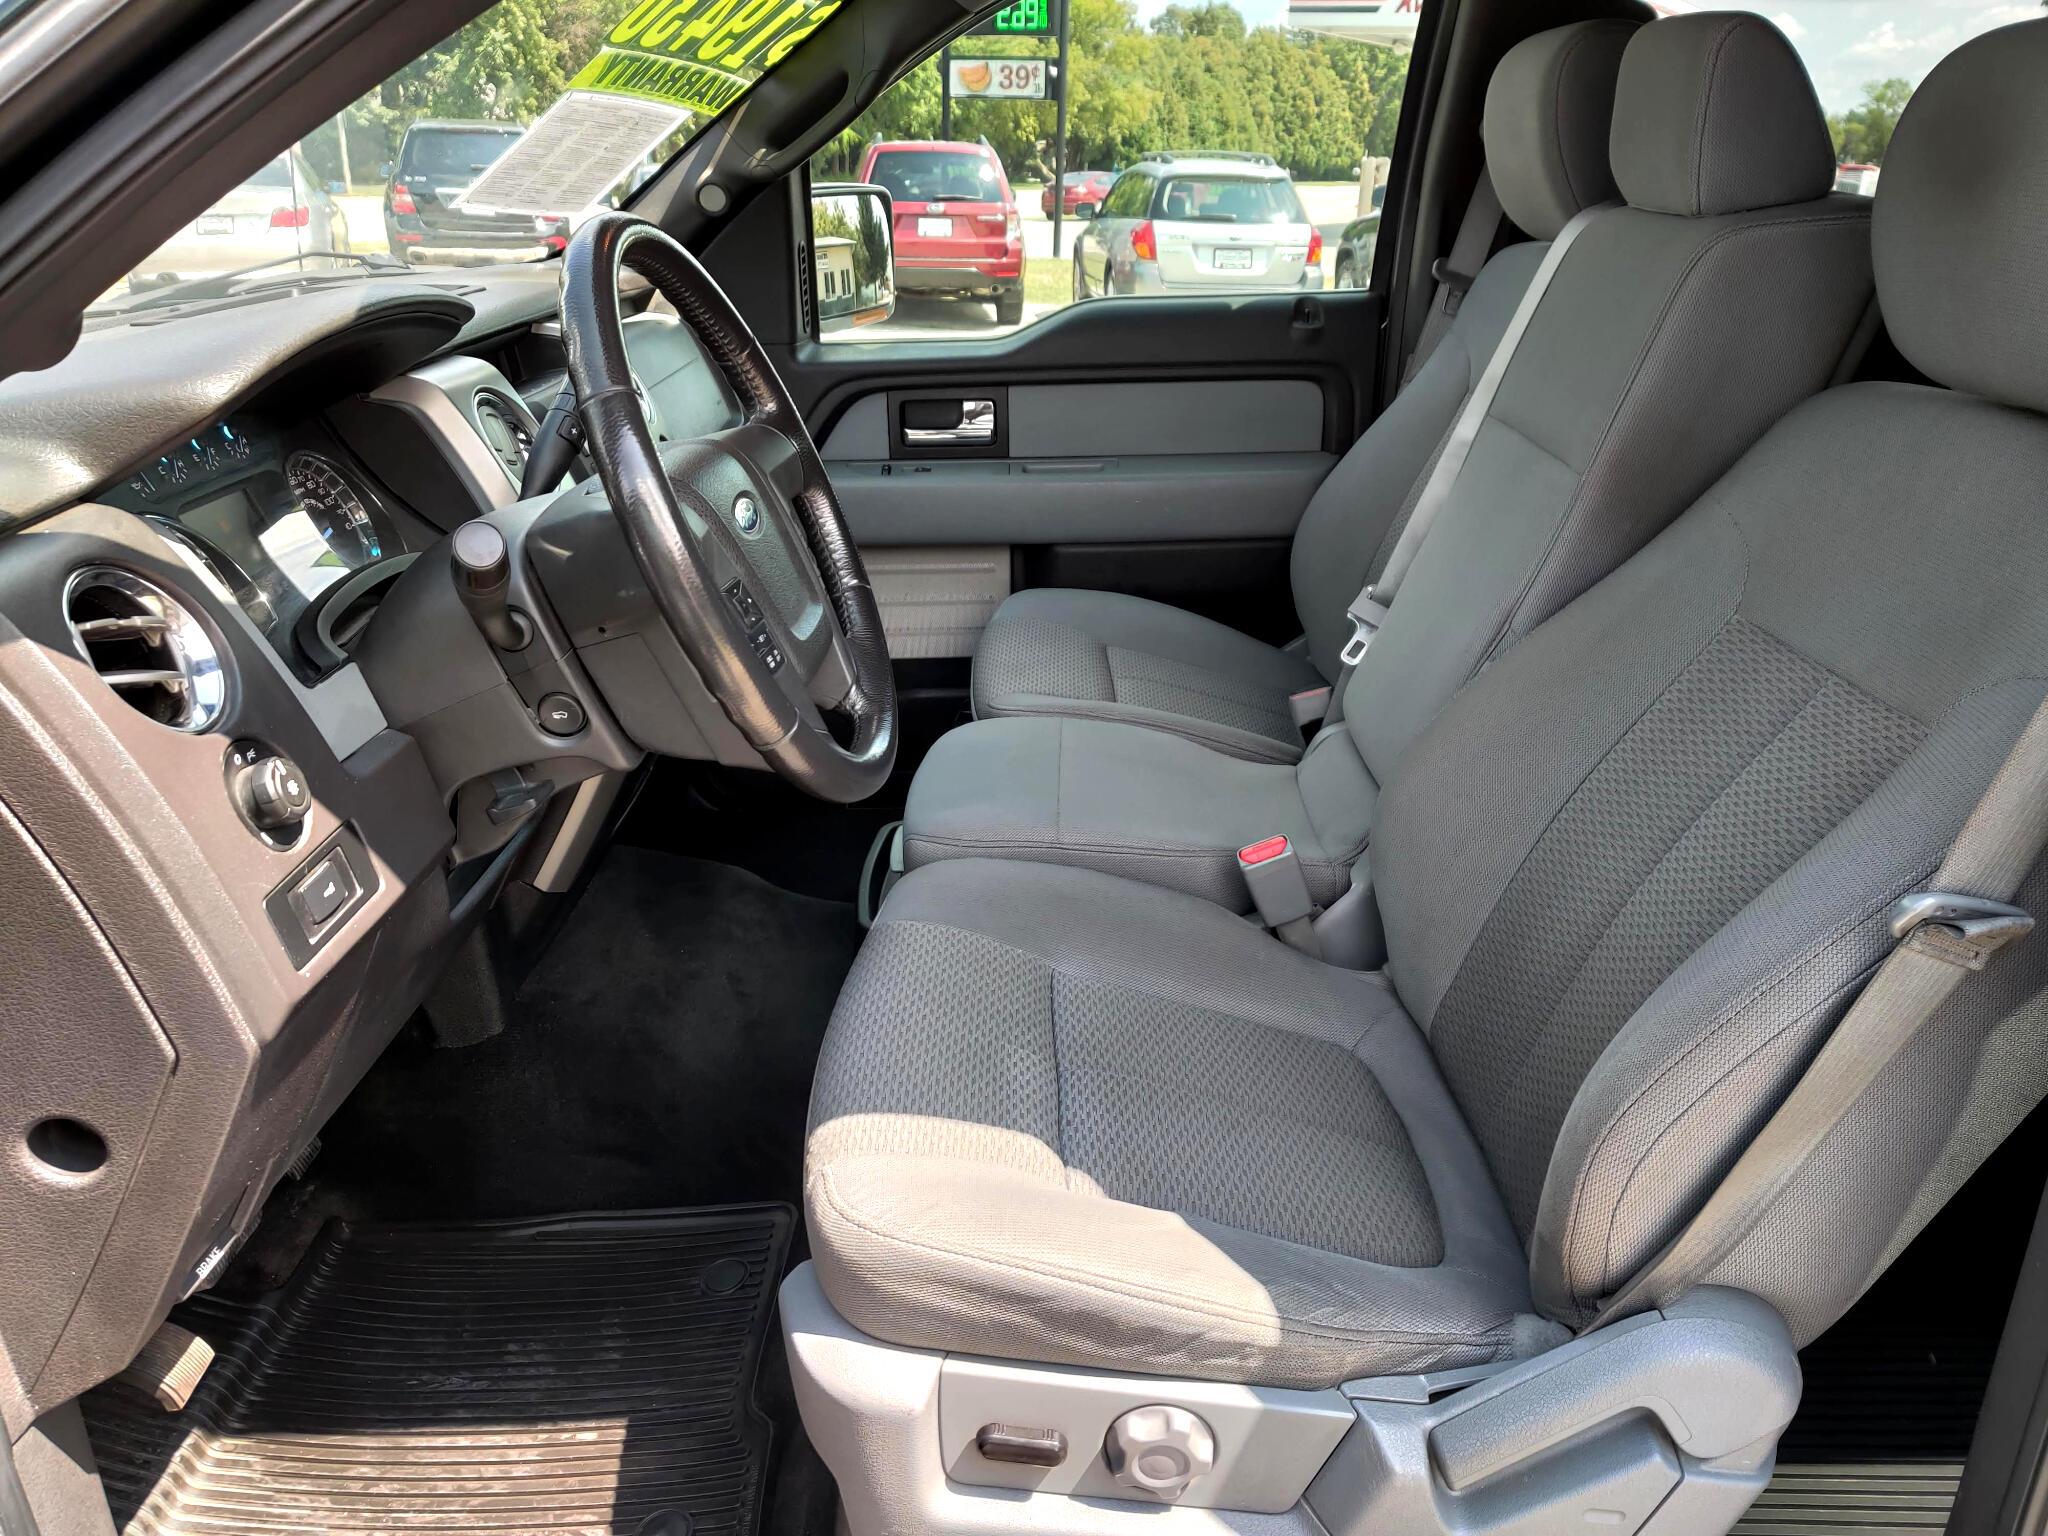 2012 Ford F-150 XLT SuperCrew 6.5-ft Box 4WD